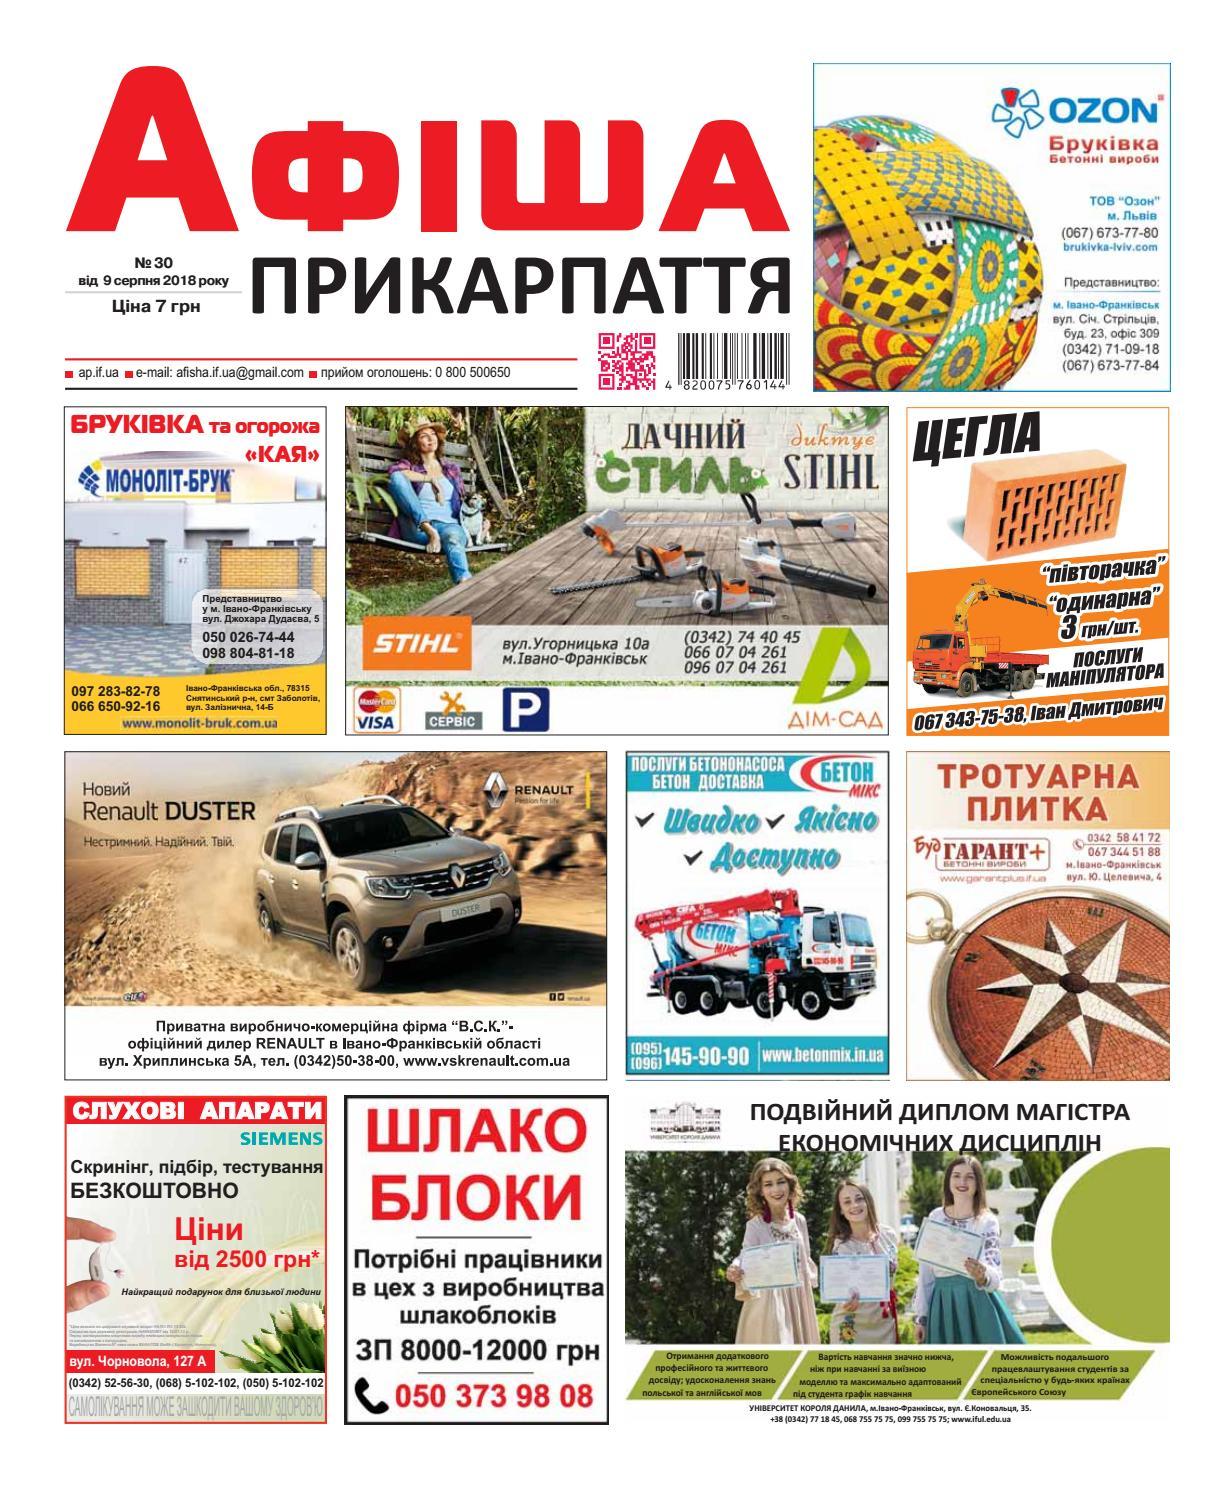 Афіша Прикарпаття № 30 by Olya Olya - issuu 0e2faa1d5a49b